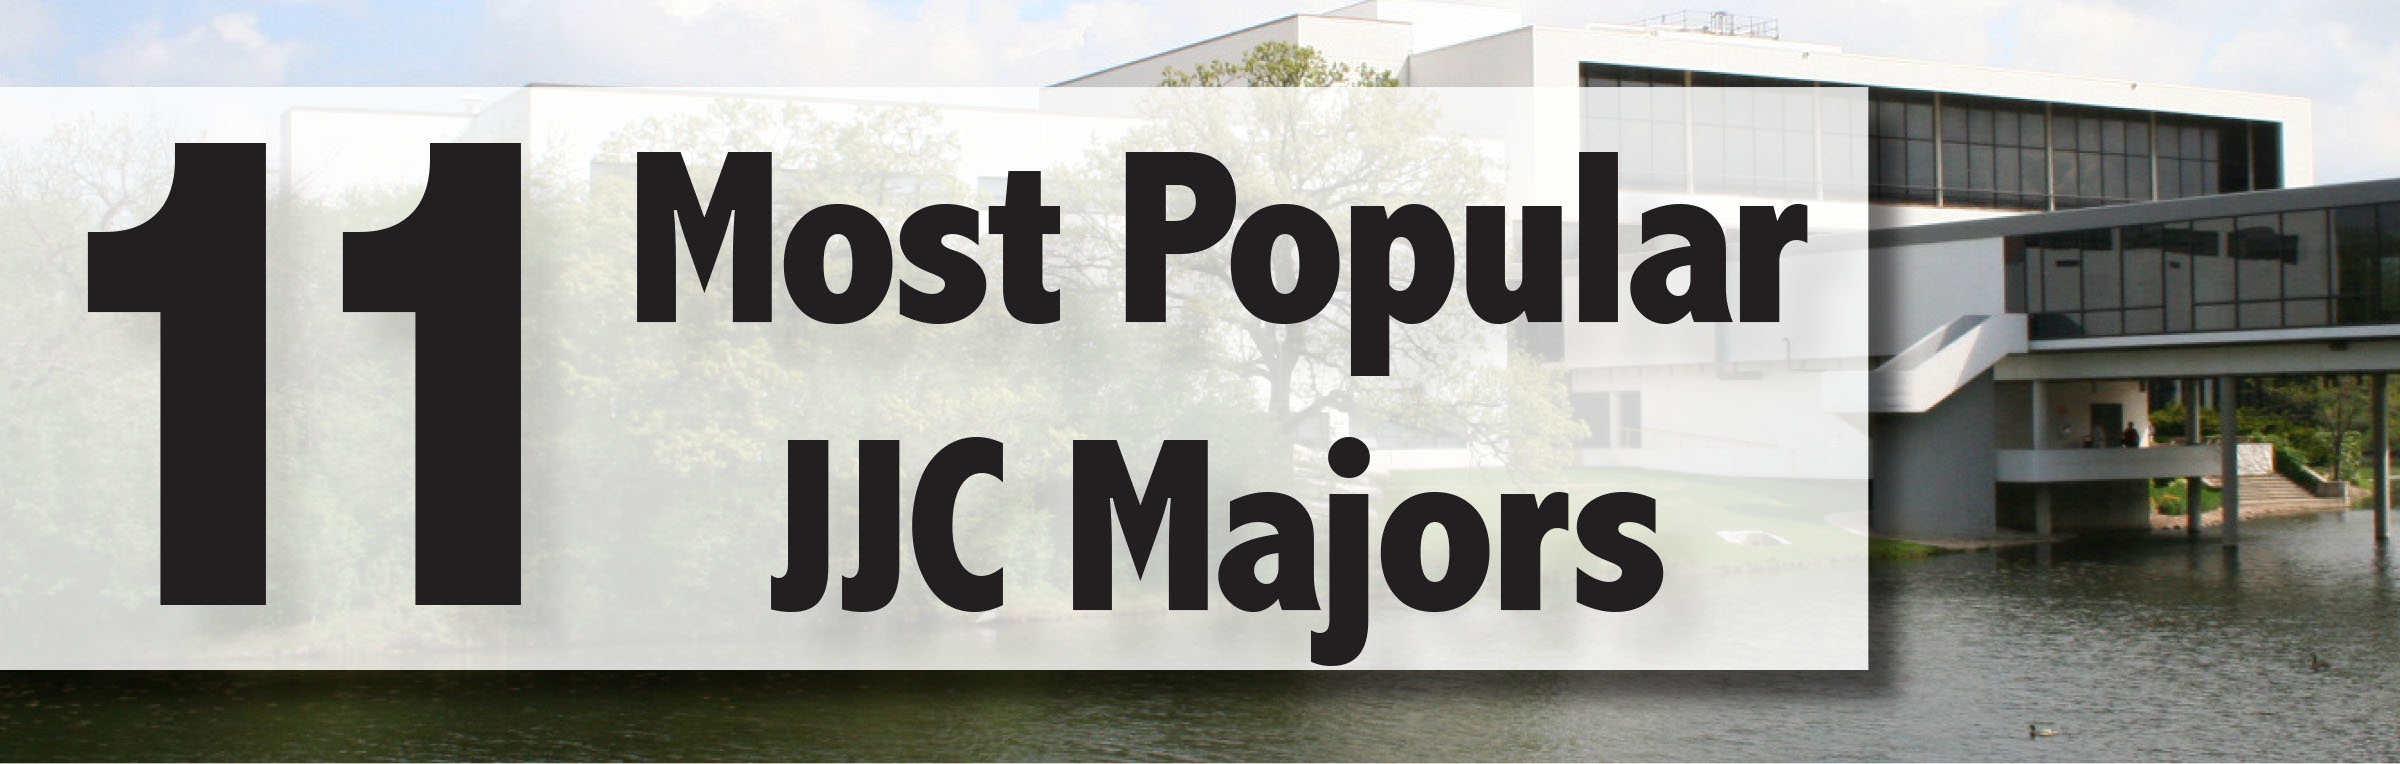 11 most popular jjc majors joliet junior college